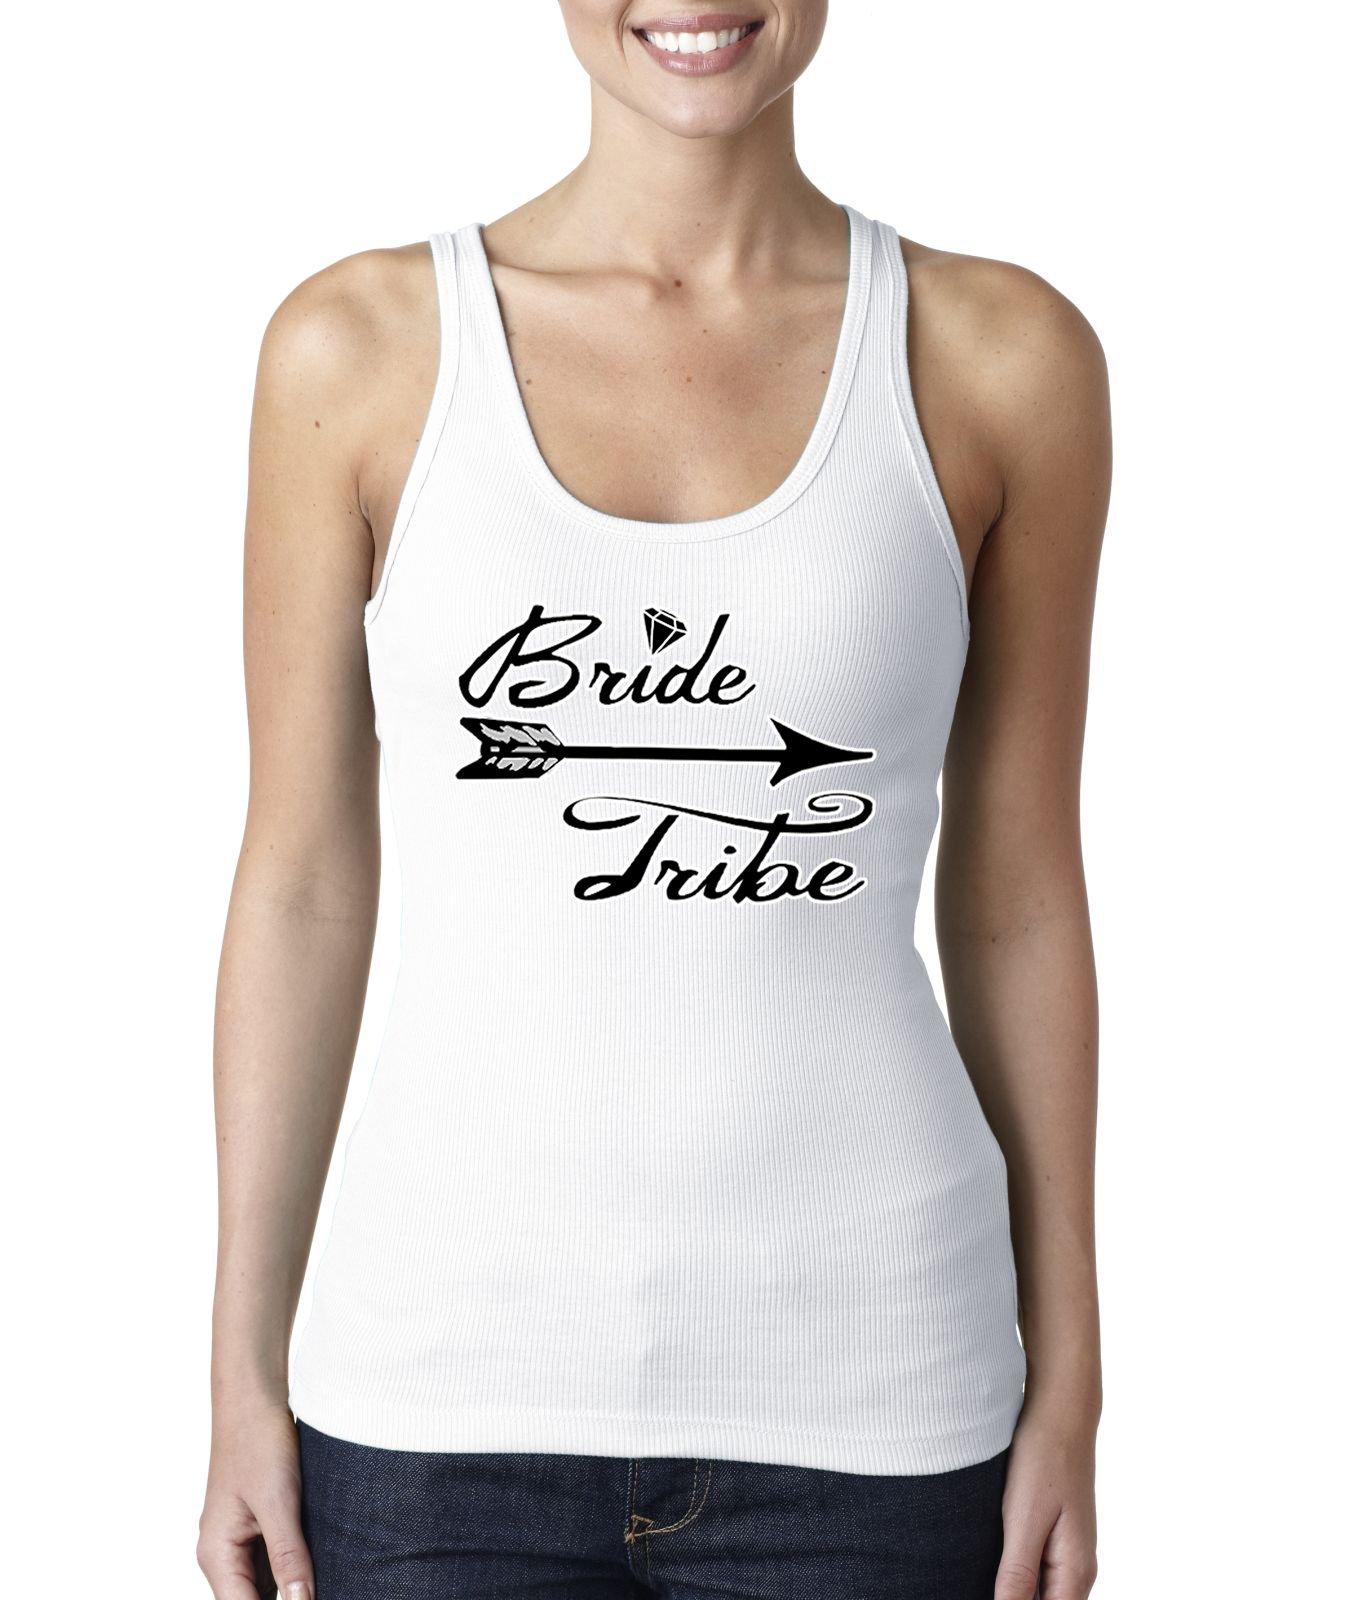 Fresh Tees® Bride Tribe Women's Shirt Wedding Shirts (X-Large, White)